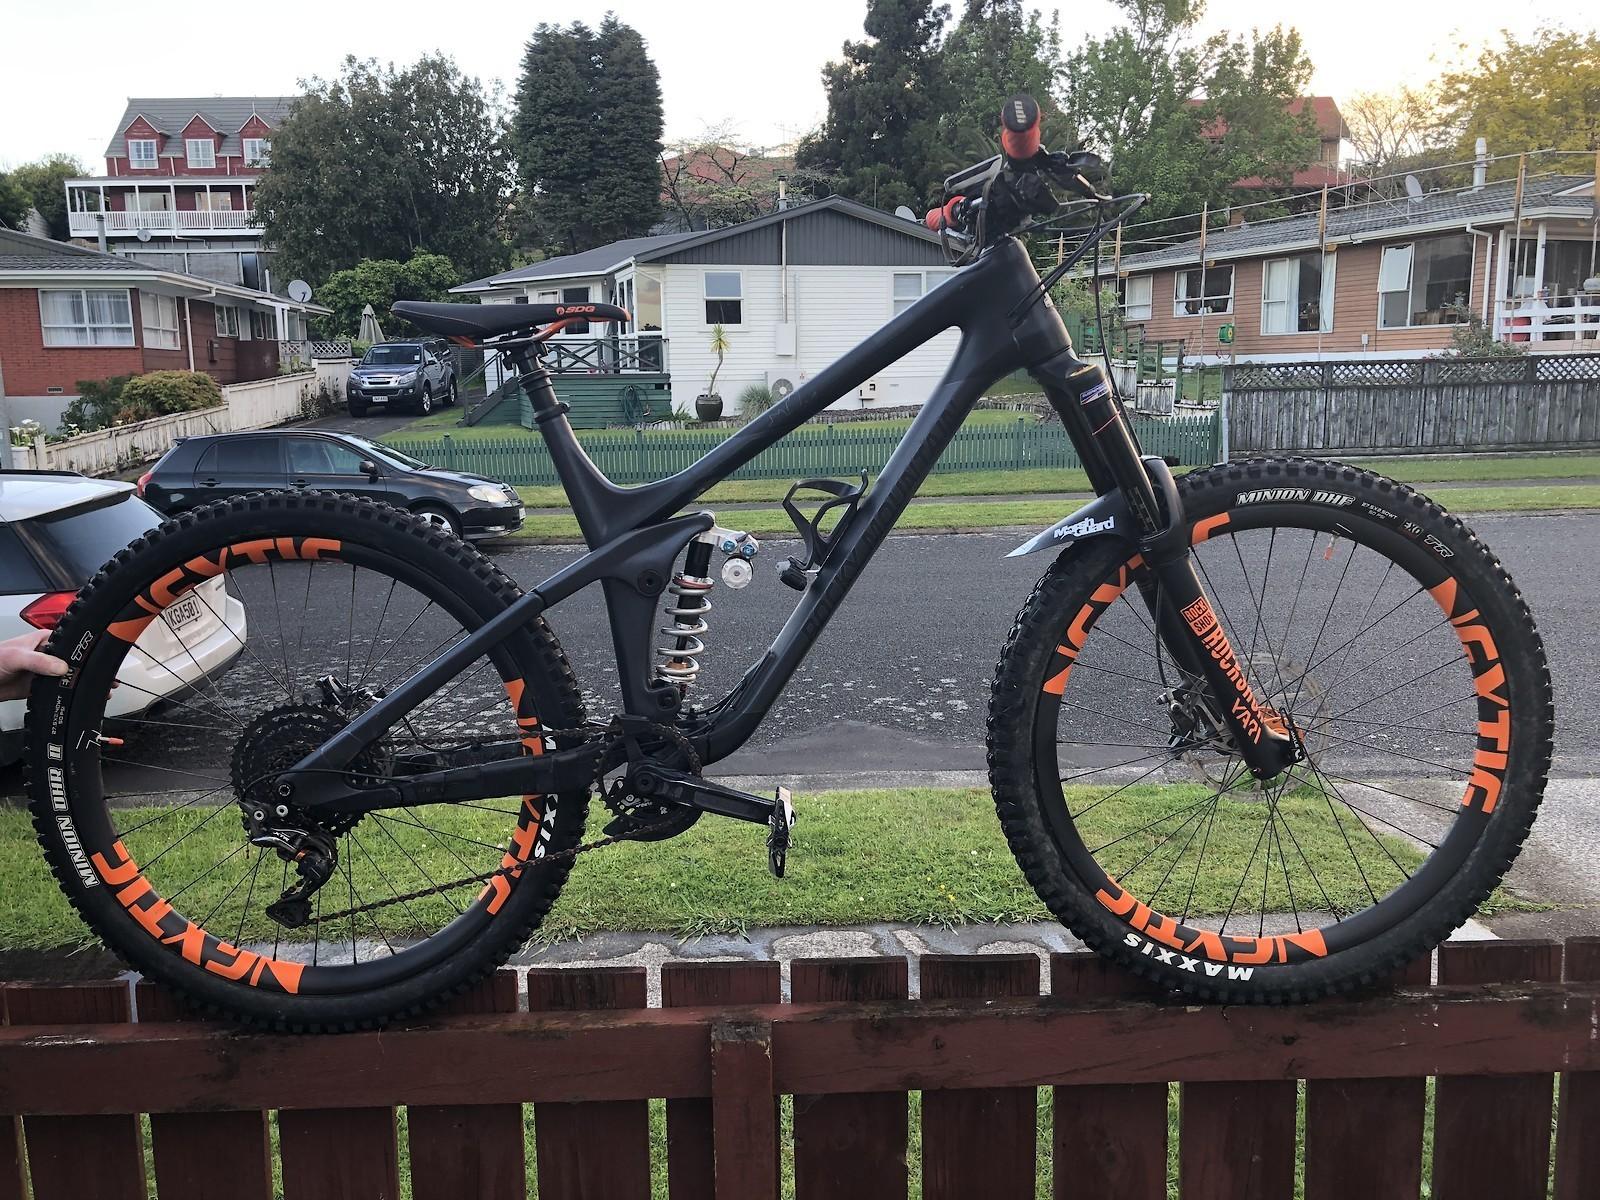 80a2e08df68 Why That Bike? Rocky Mountain Slayer - Mountain Bikes Feature ...